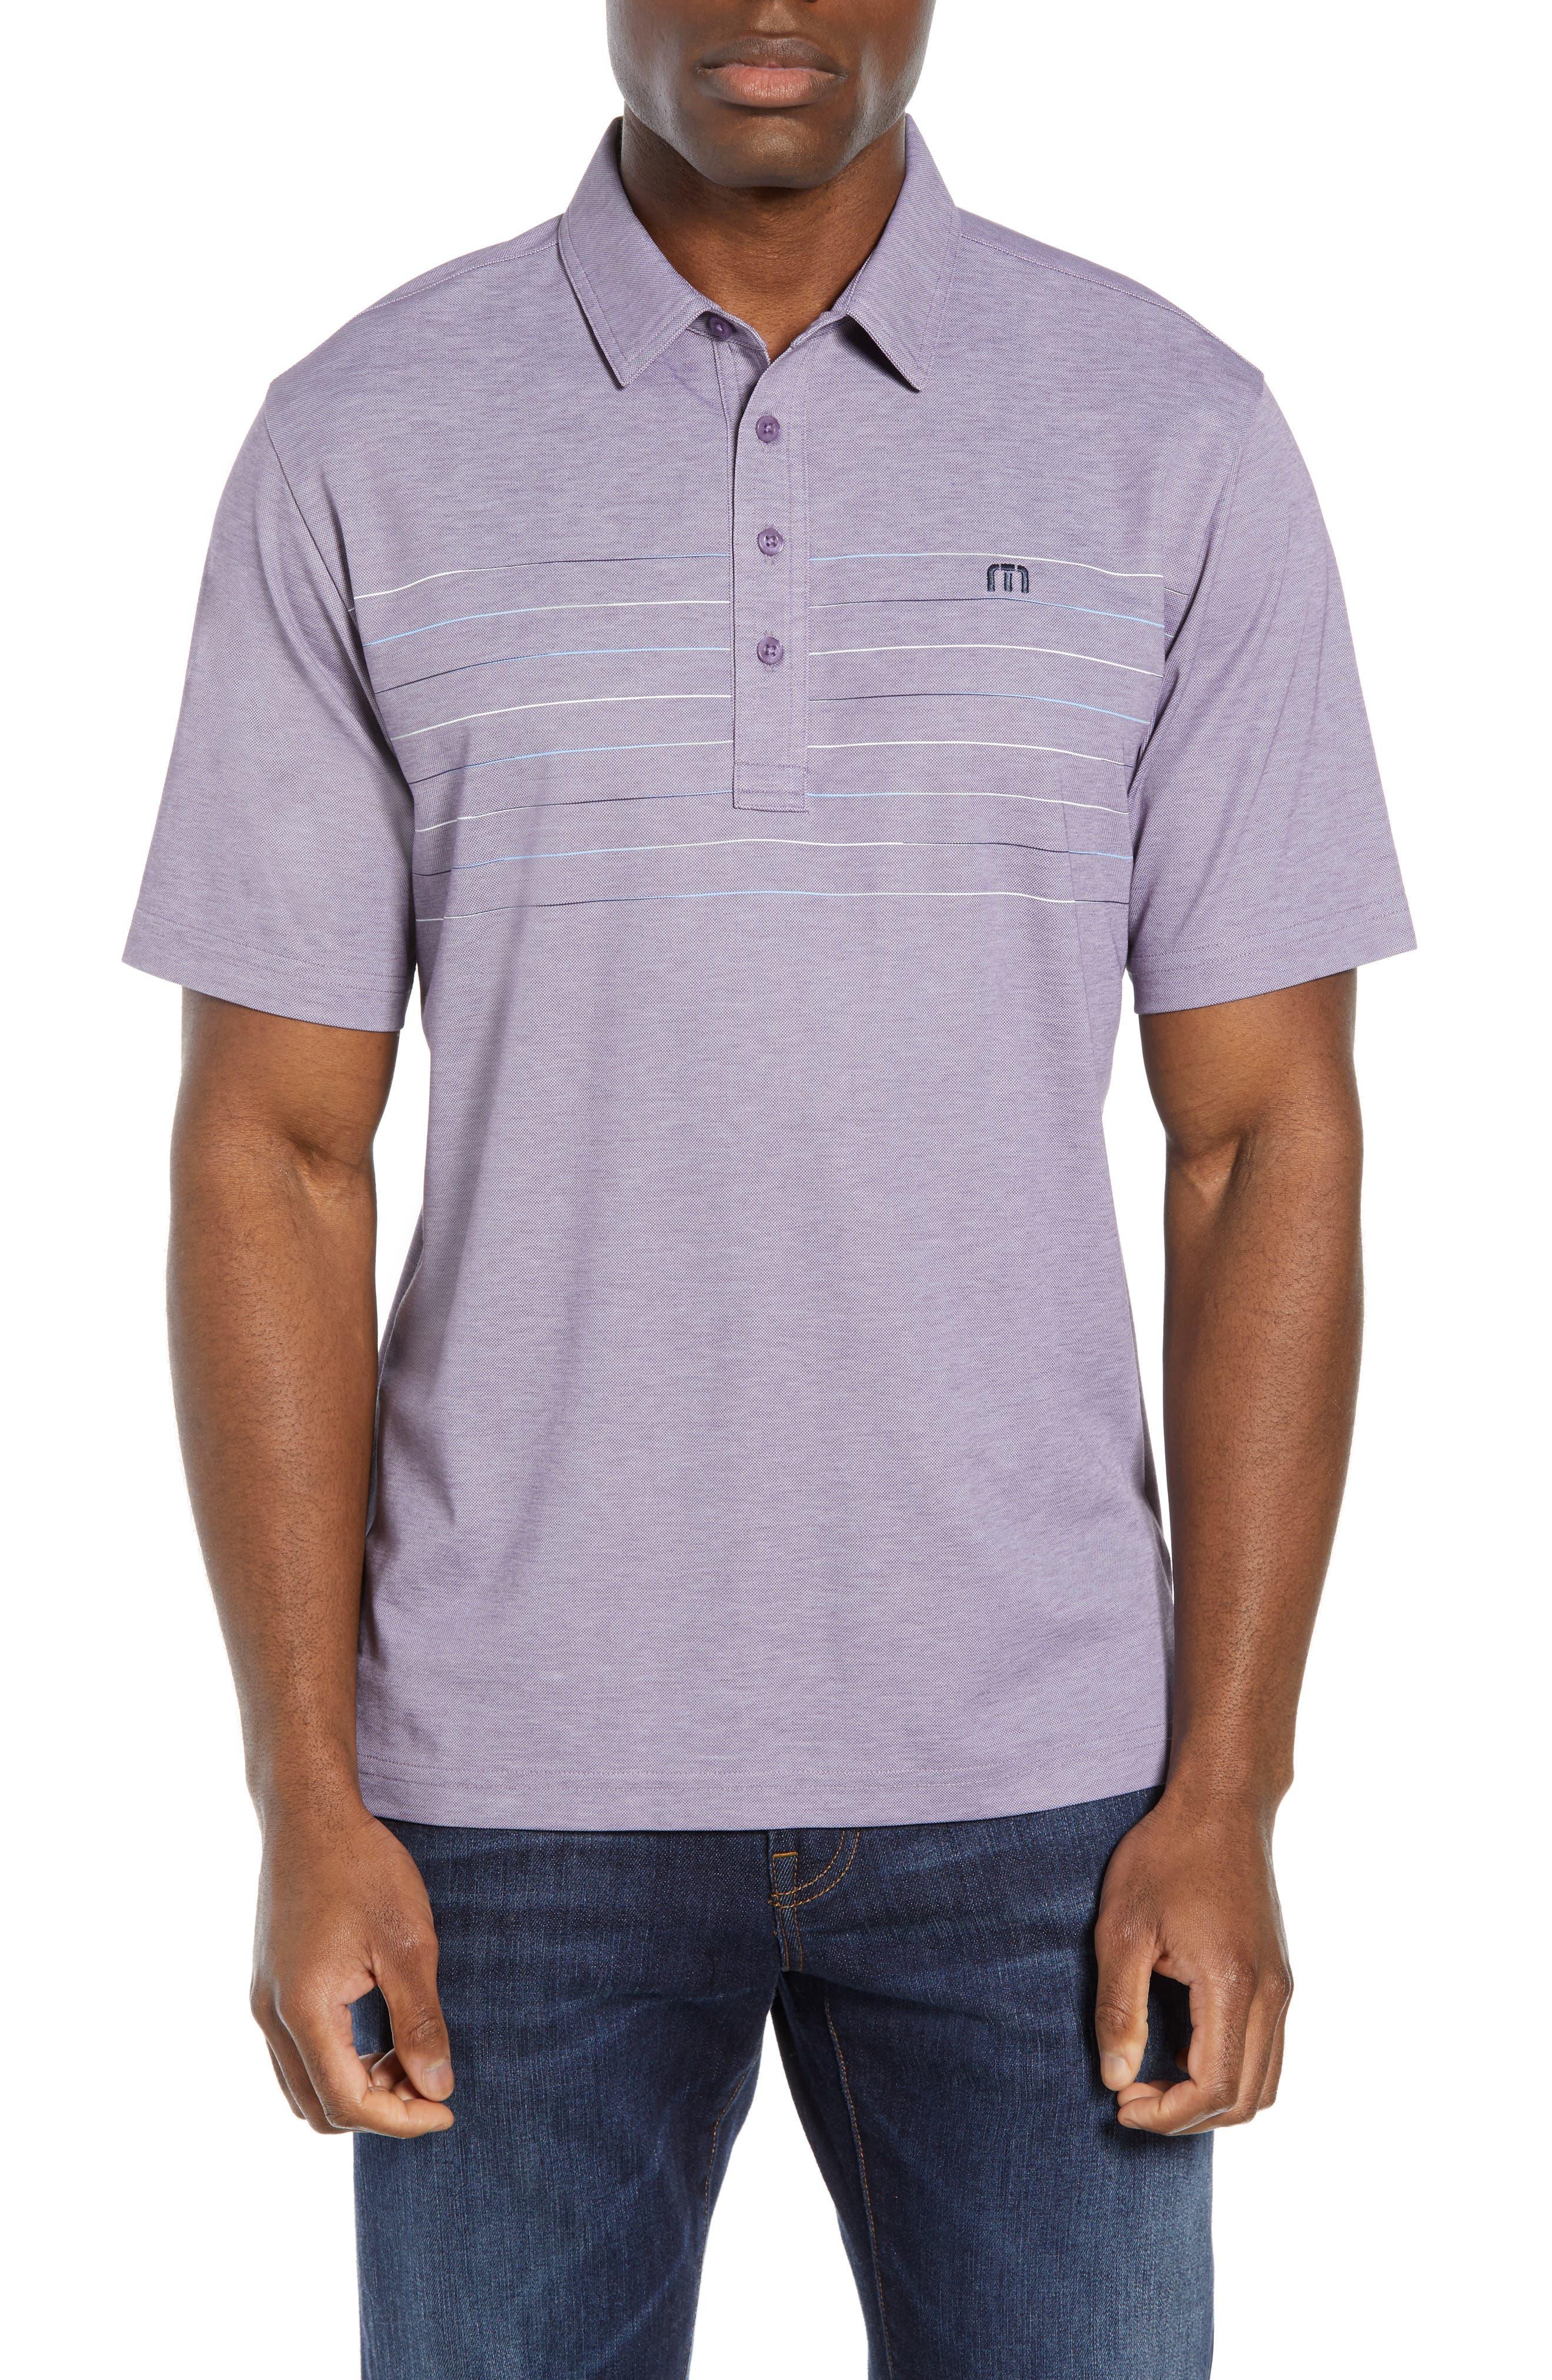 Travismathew Good Good Polo Shirt,  Purple